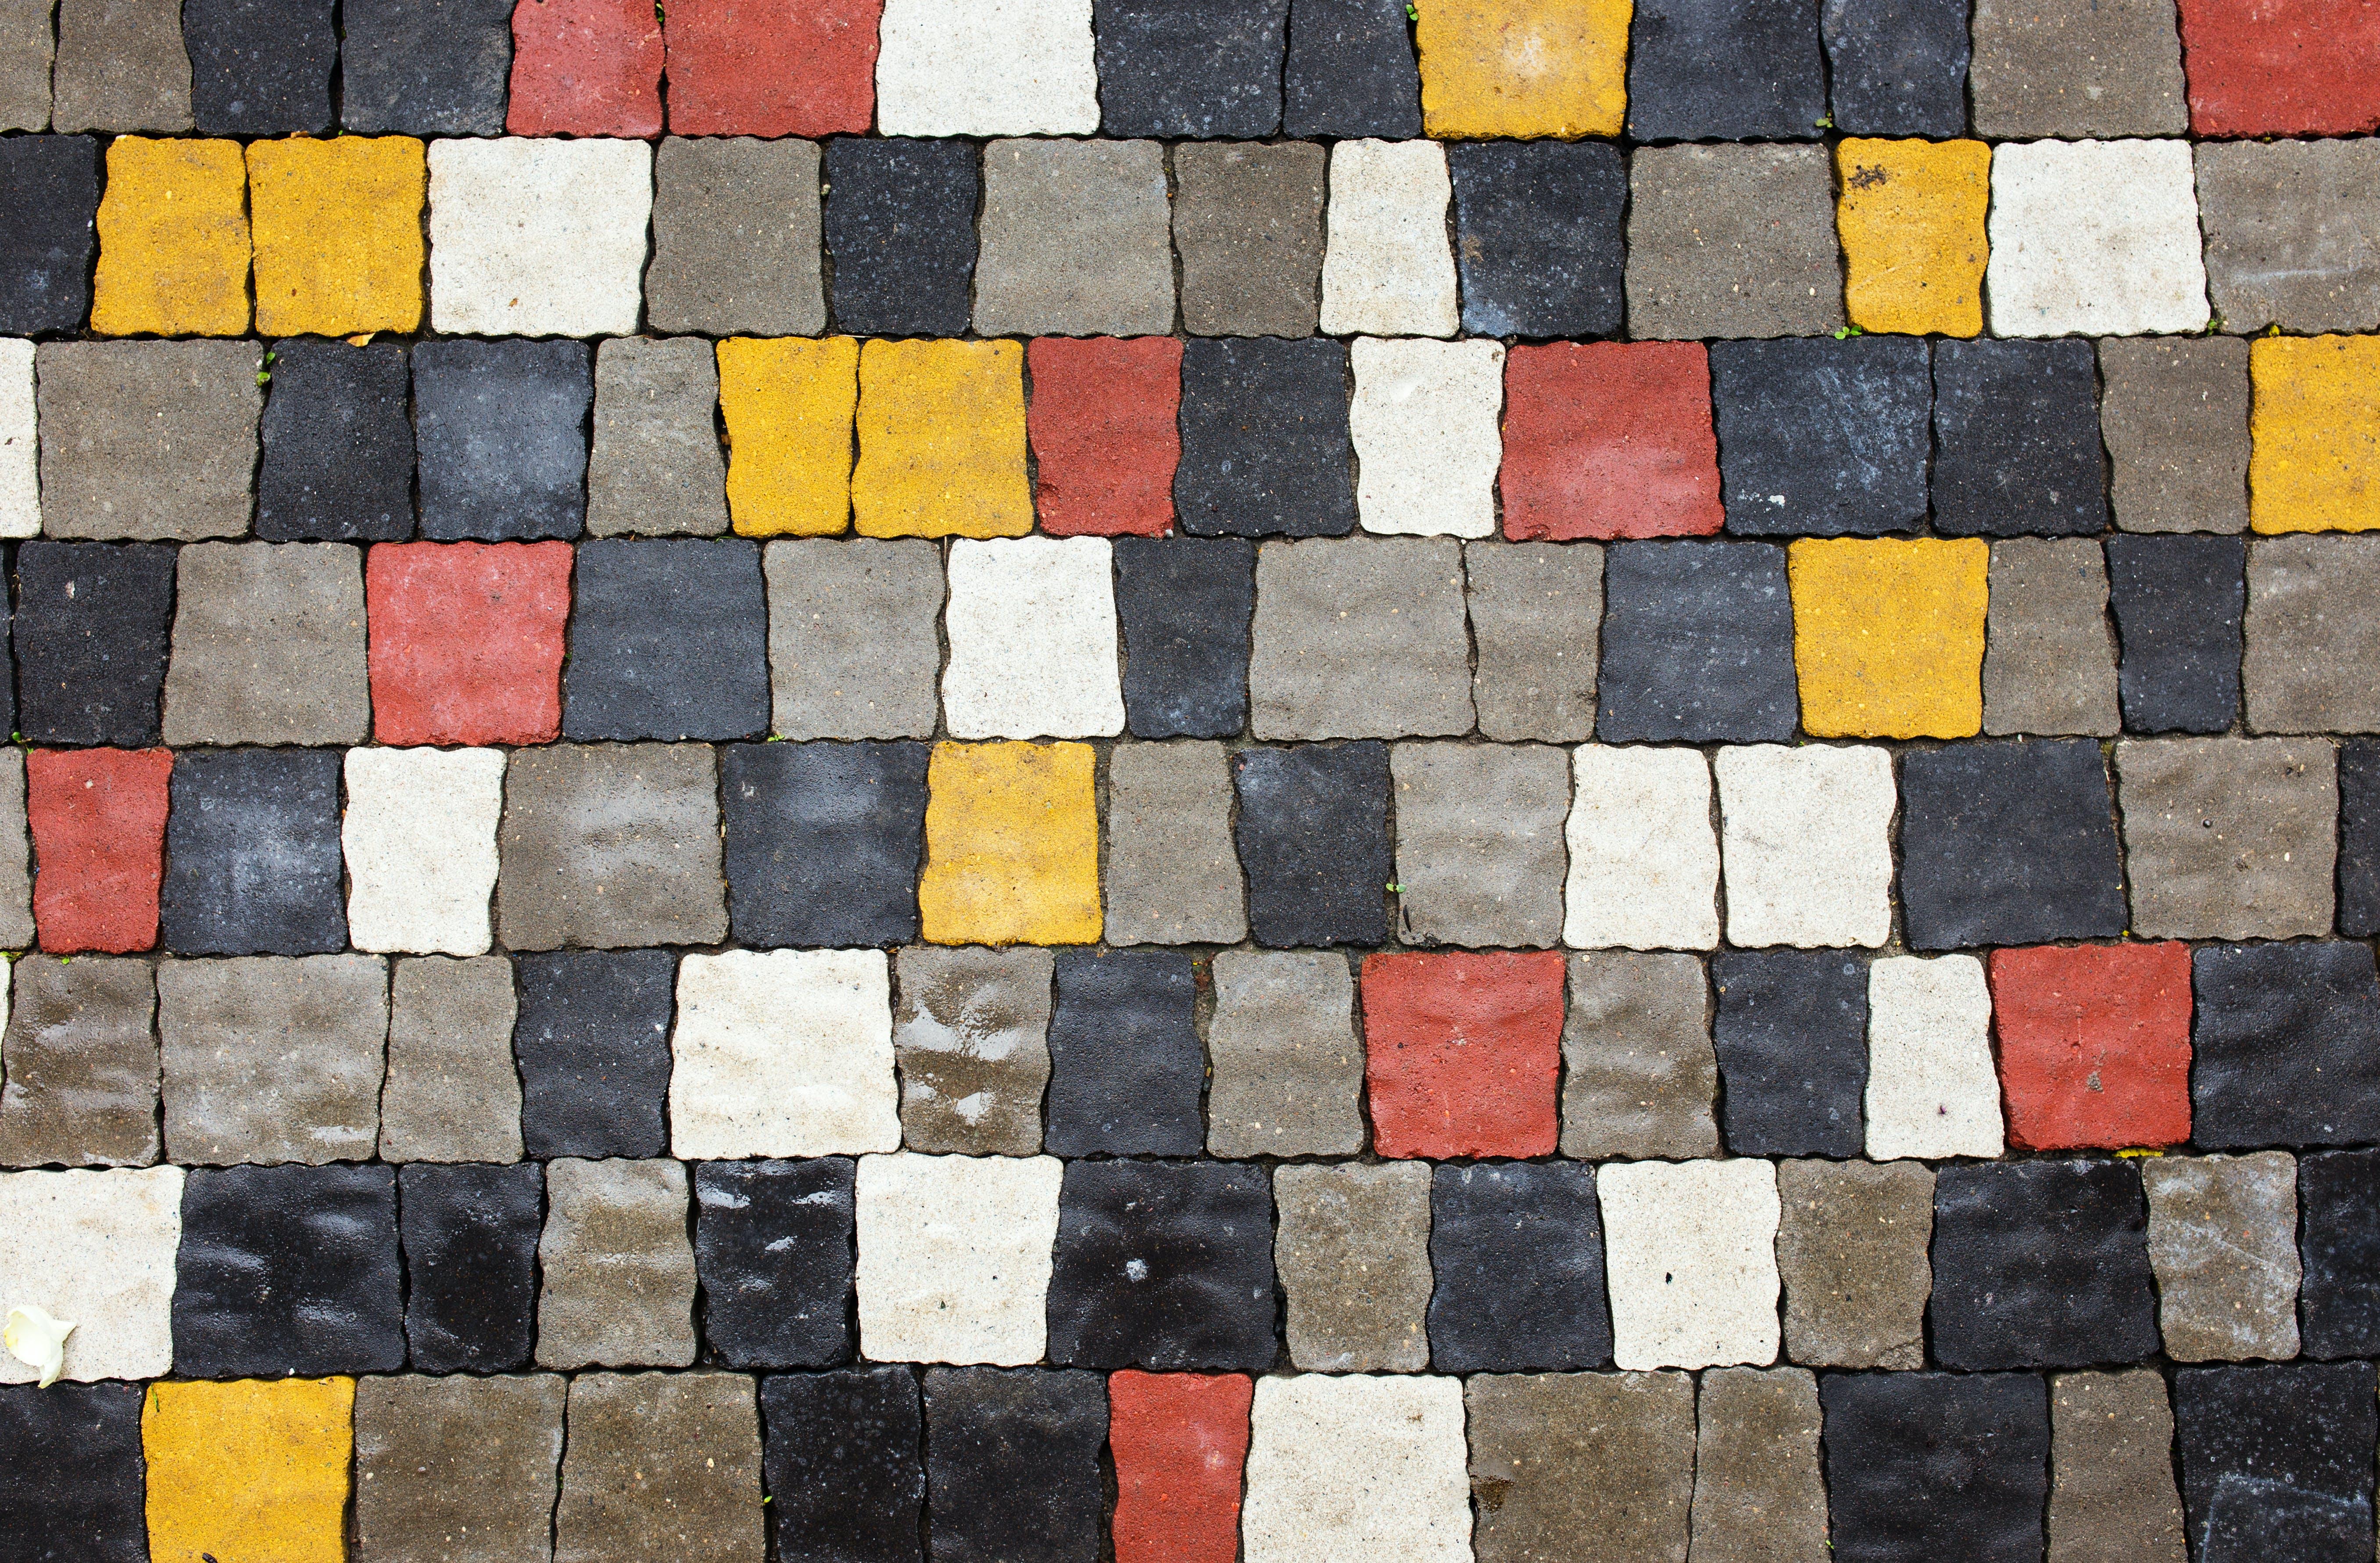 Decorative treatment on footpath